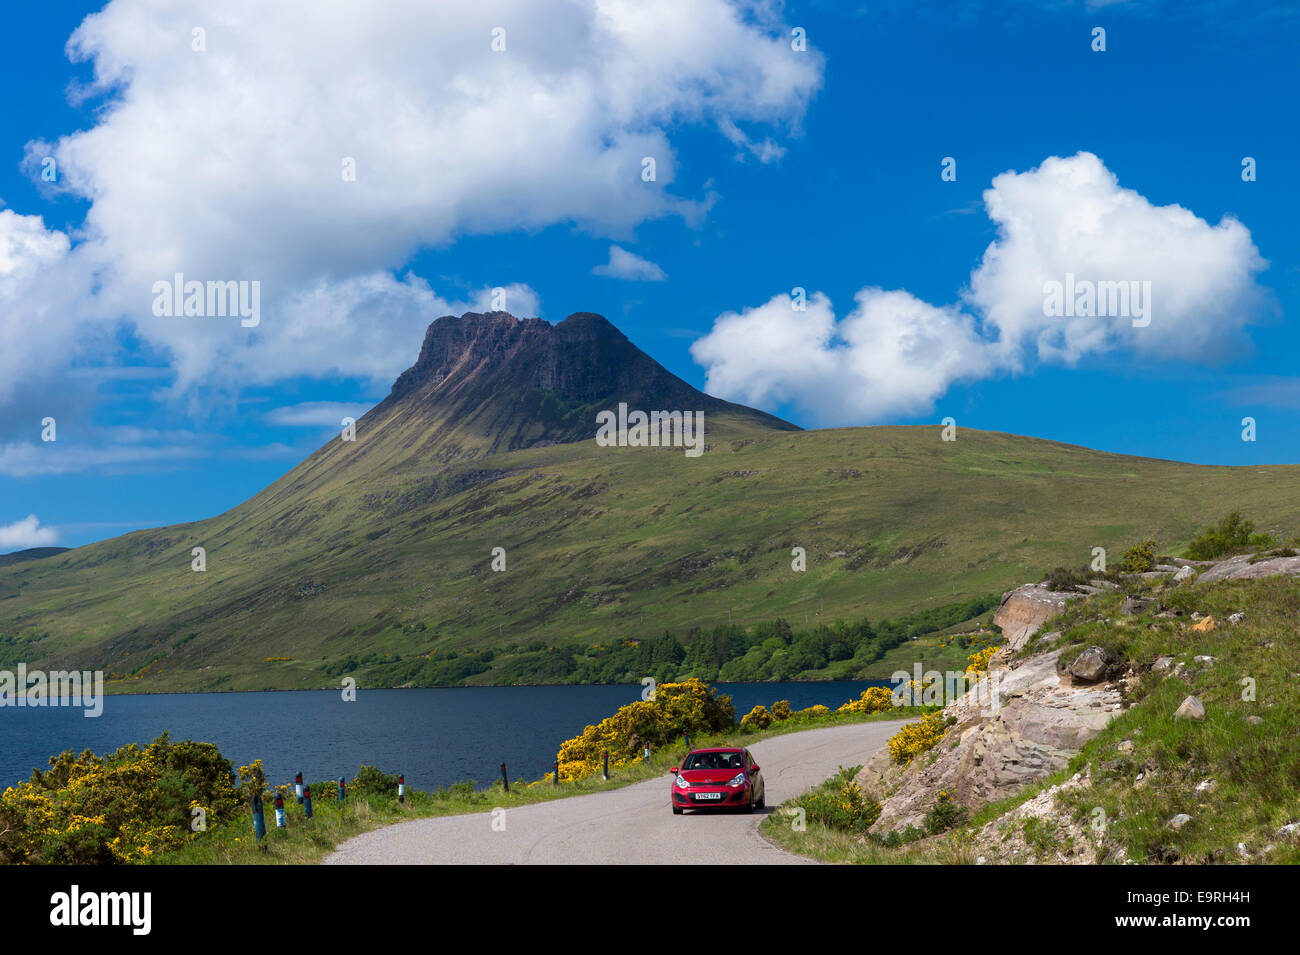 Autofahrer auf Urlaub touring Pässe Stac Pollaidh, Stack Polly, Berg, im Inverpolly National Nature Reserve Stockbild